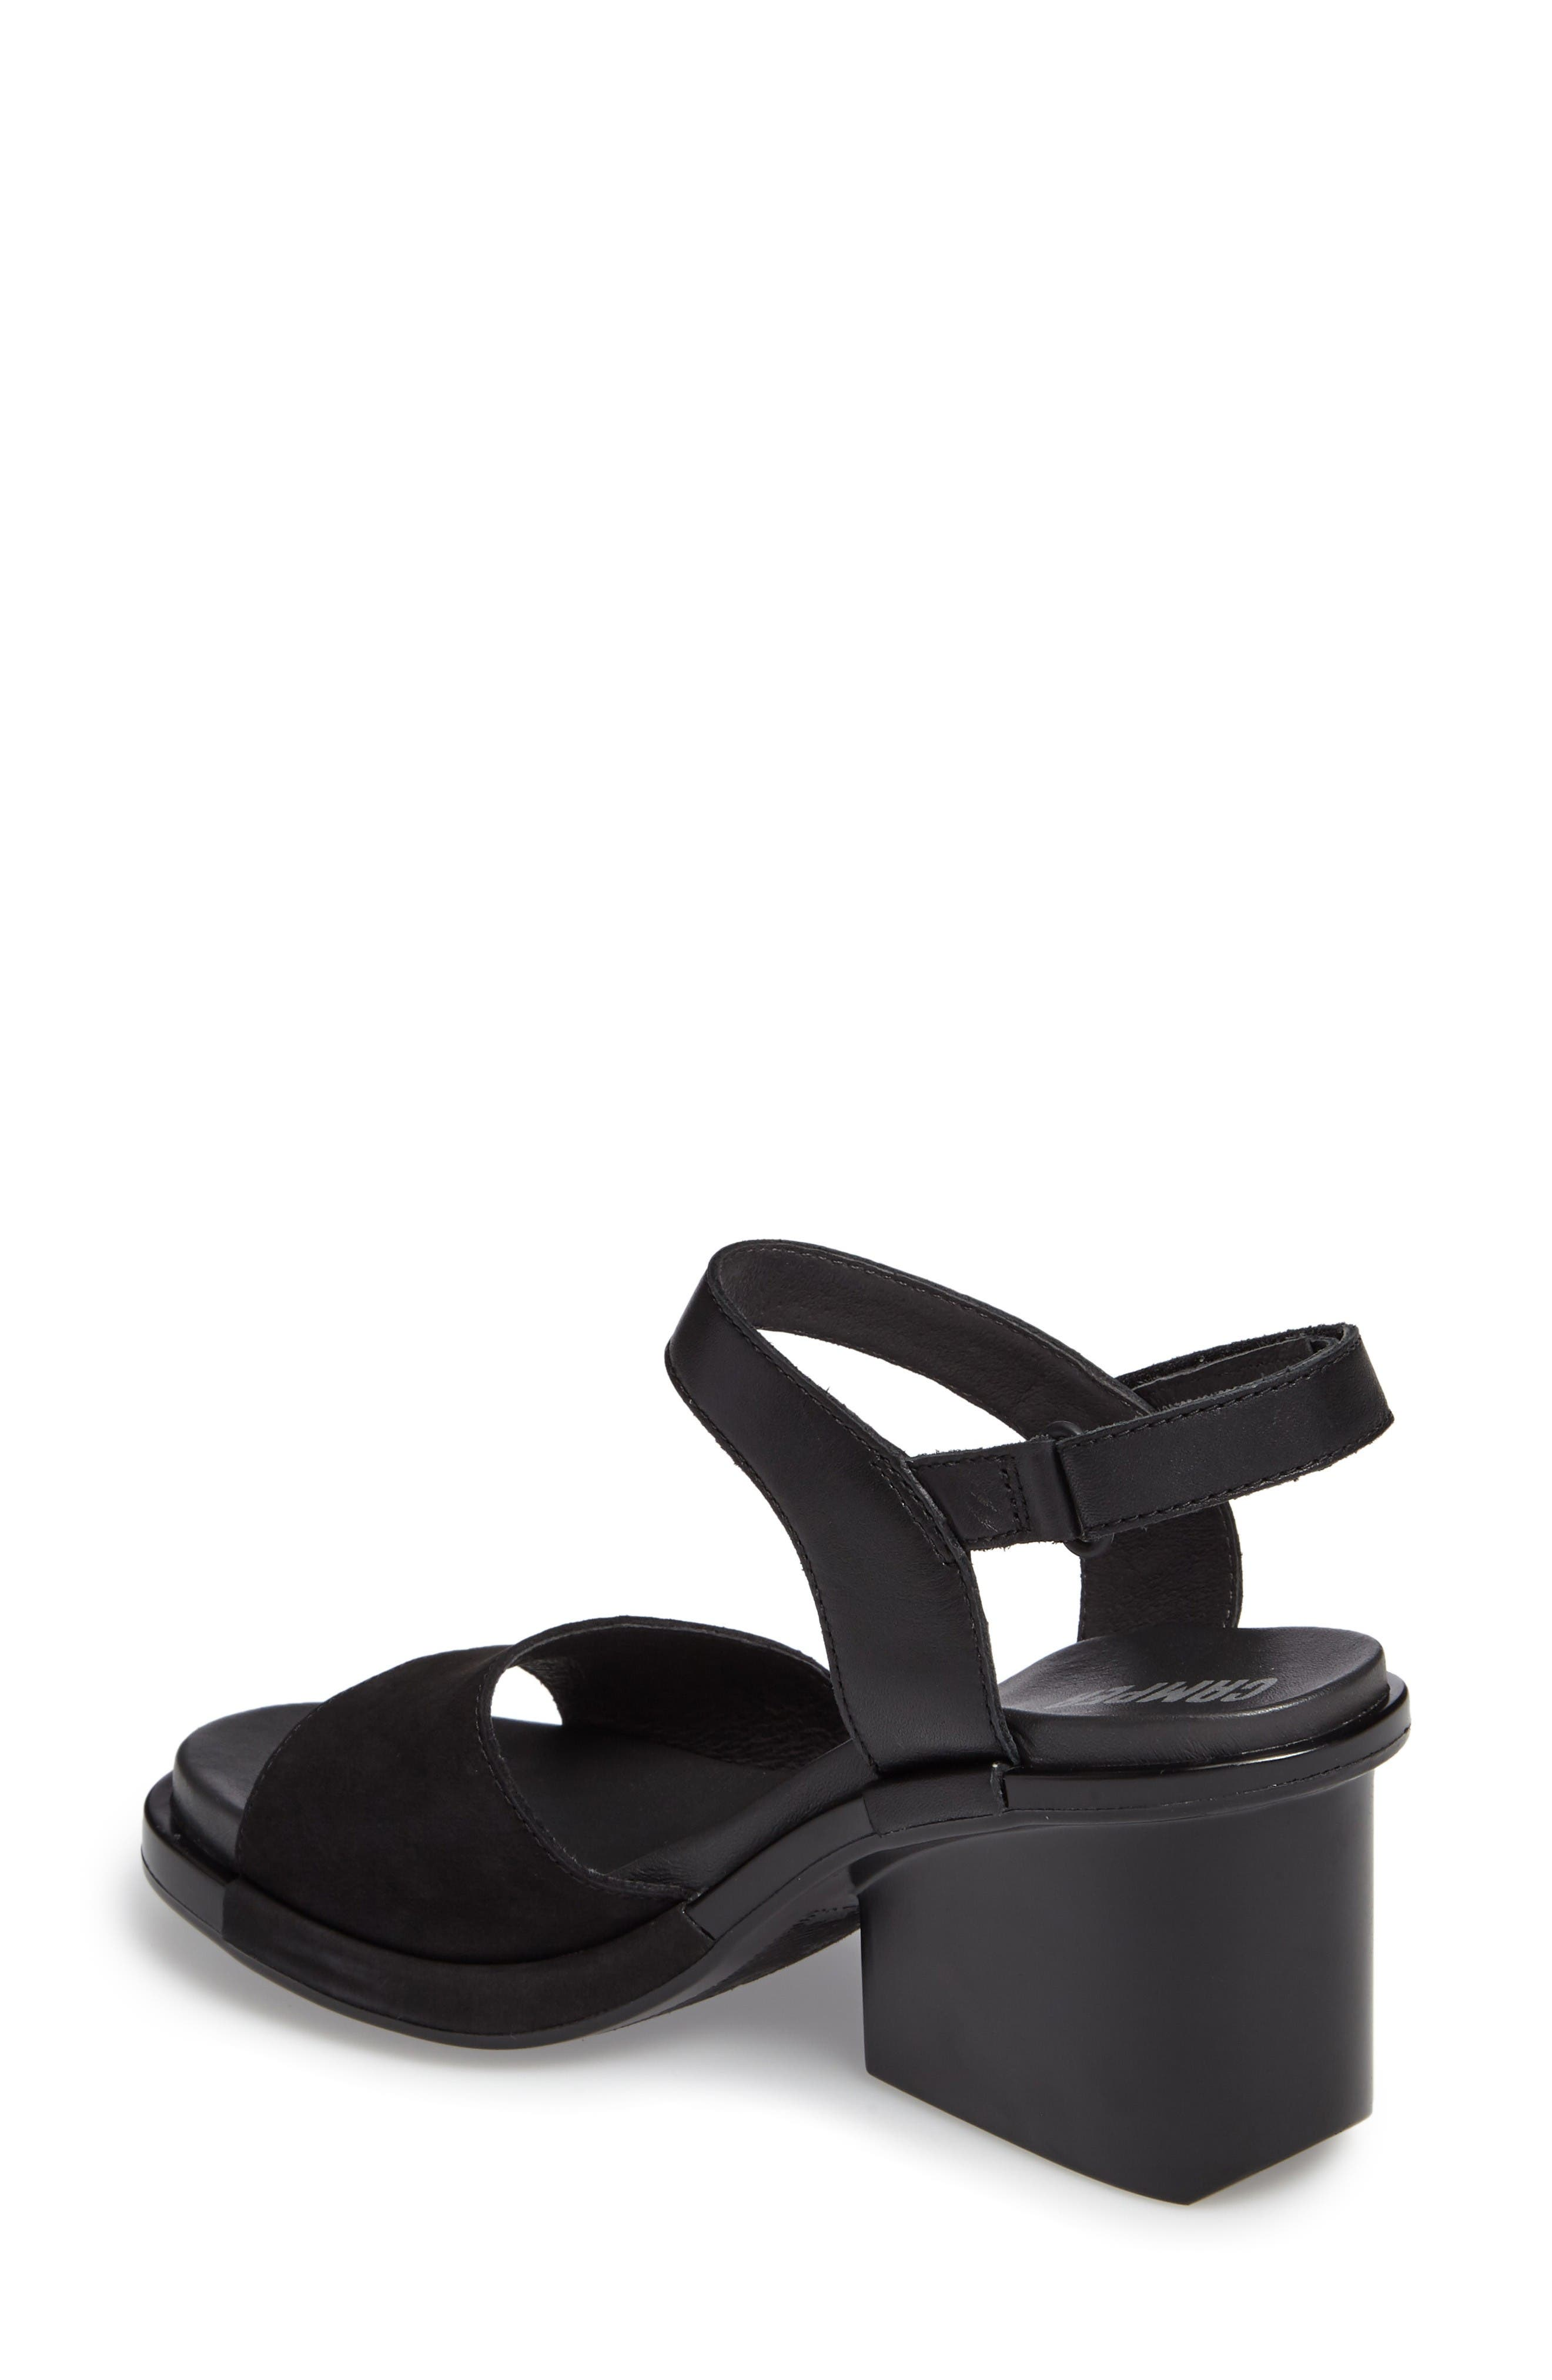 Ivy Ankle Strap Sandal,                             Alternate thumbnail 2, color,                             Black Leather